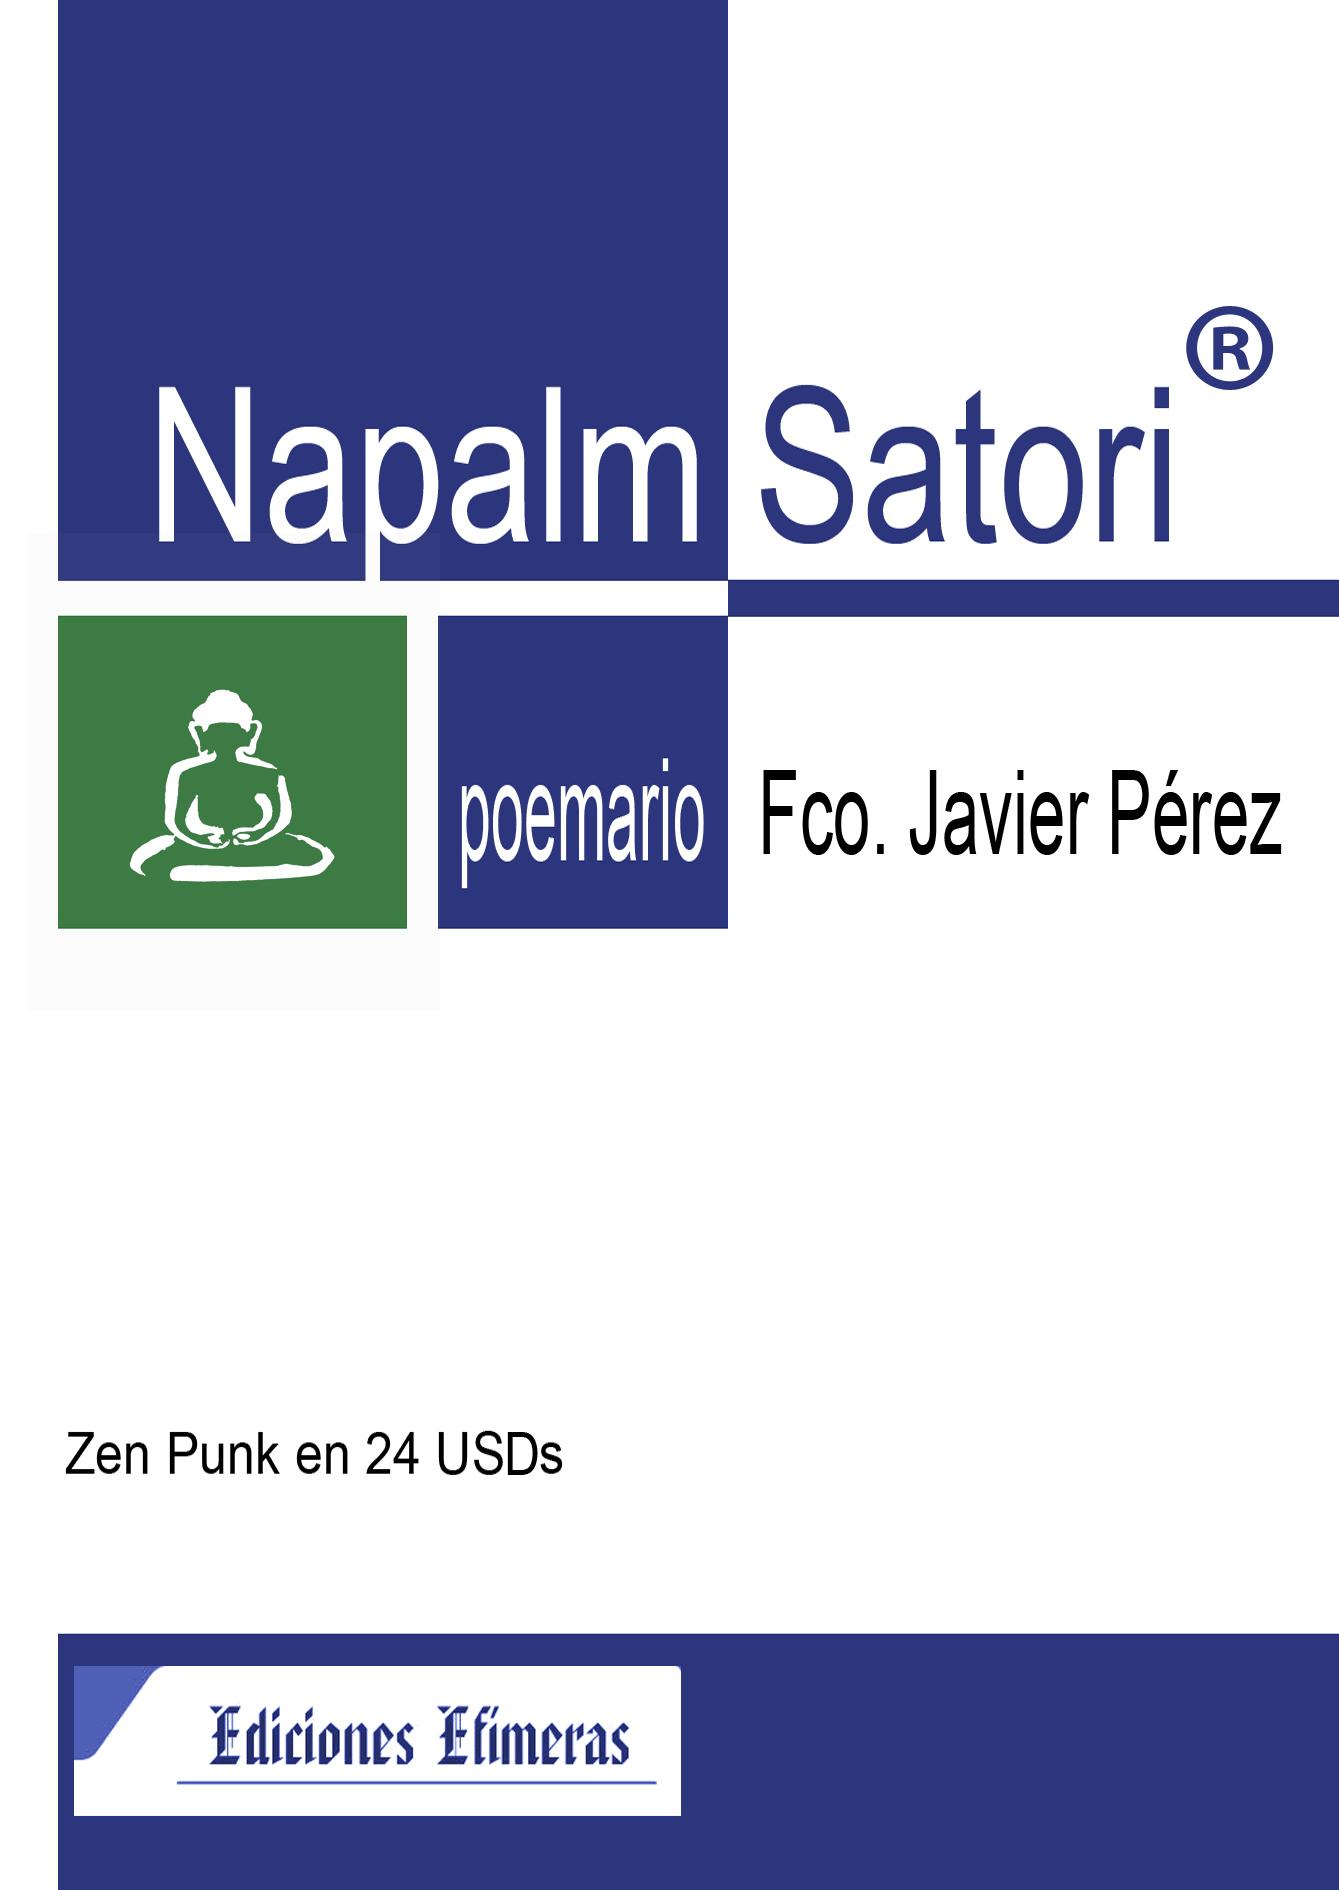 napalm2009b